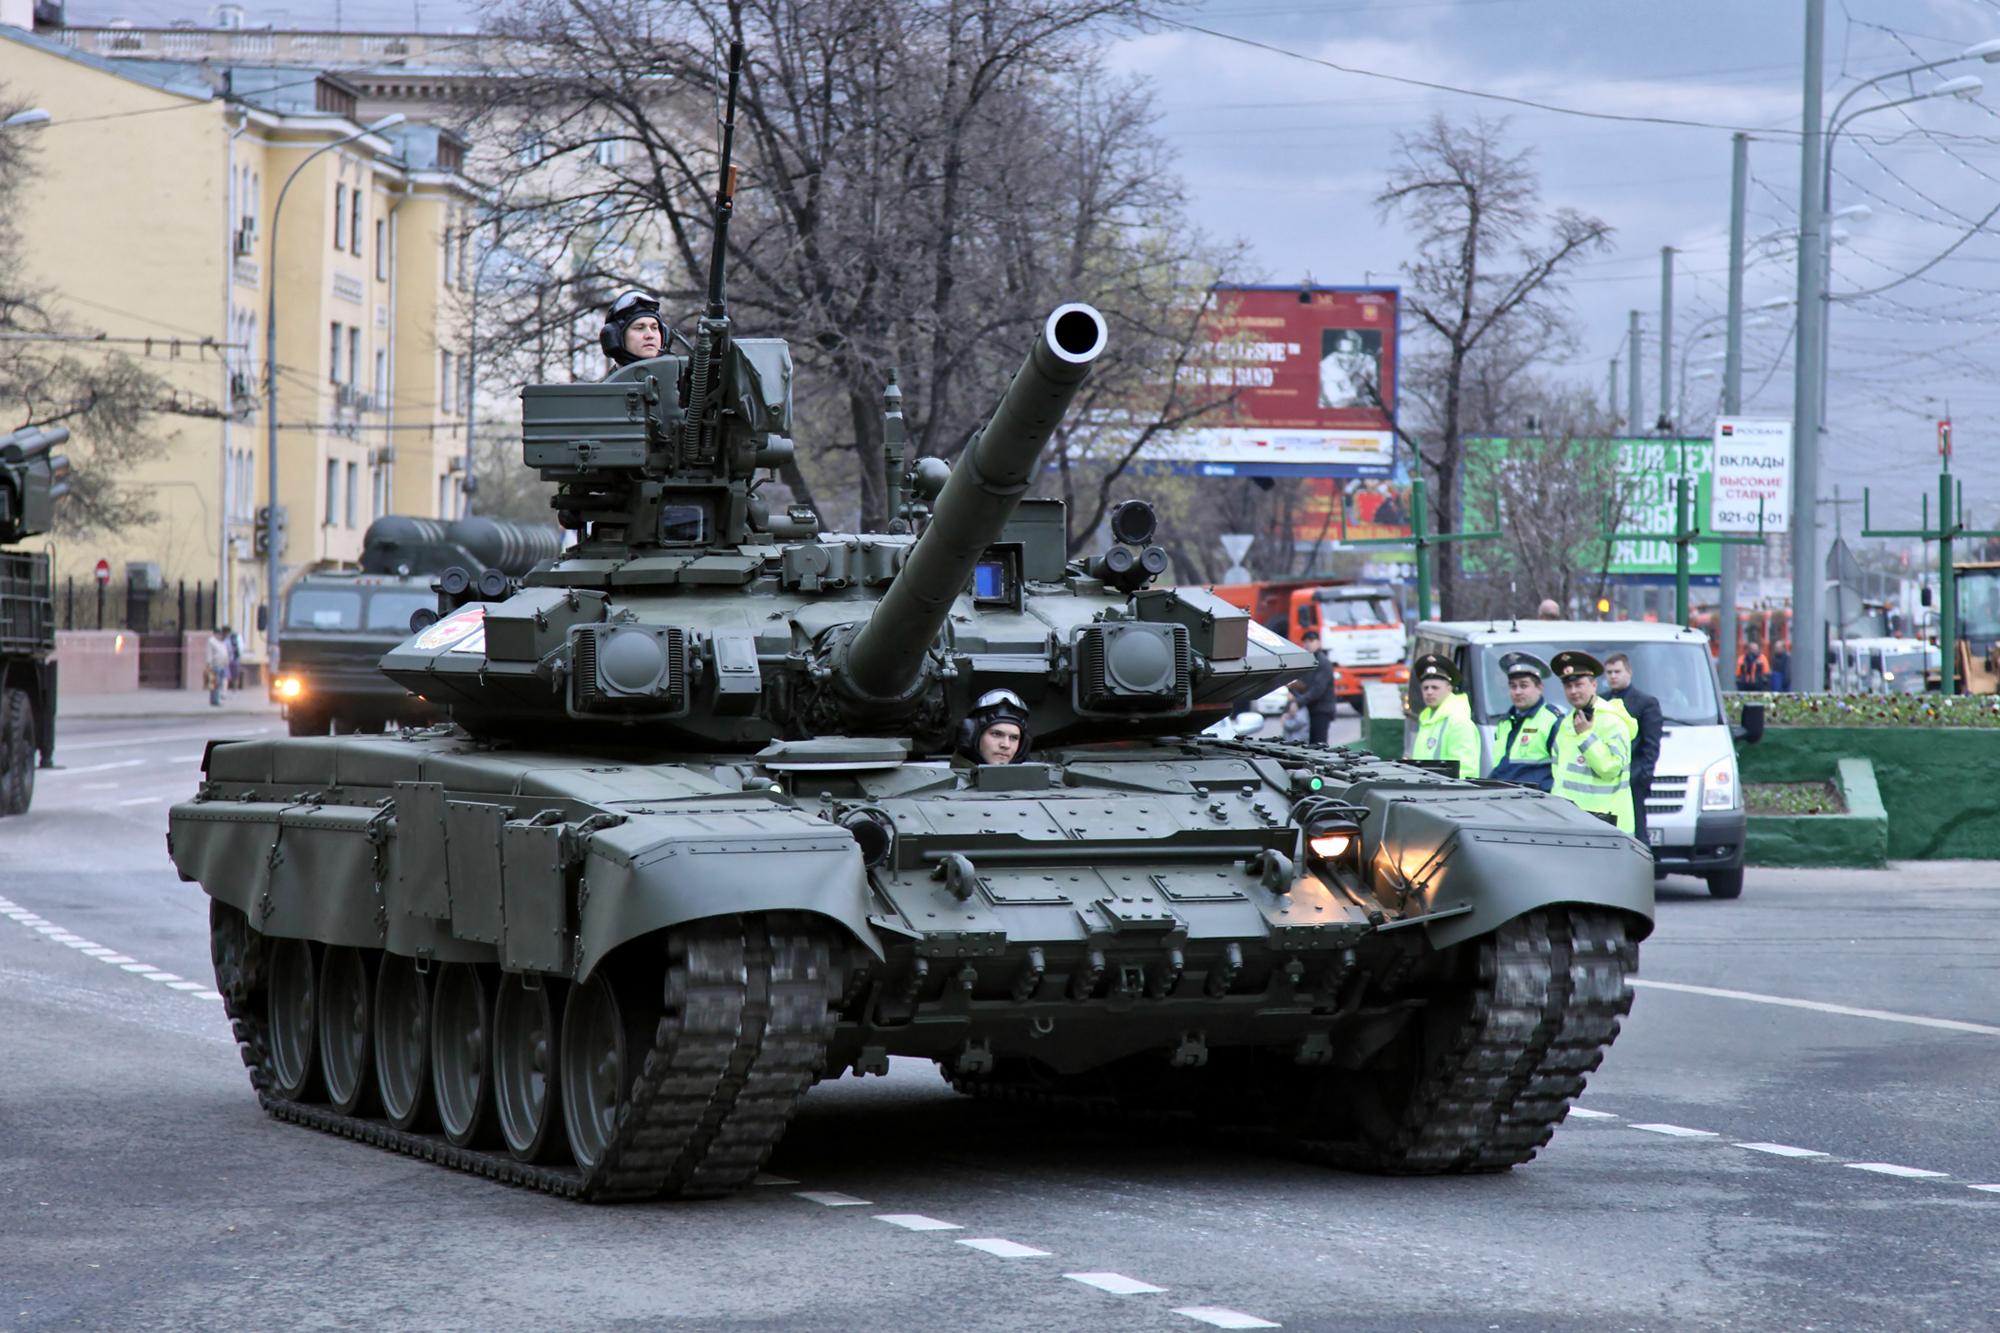 Depiction of T-90